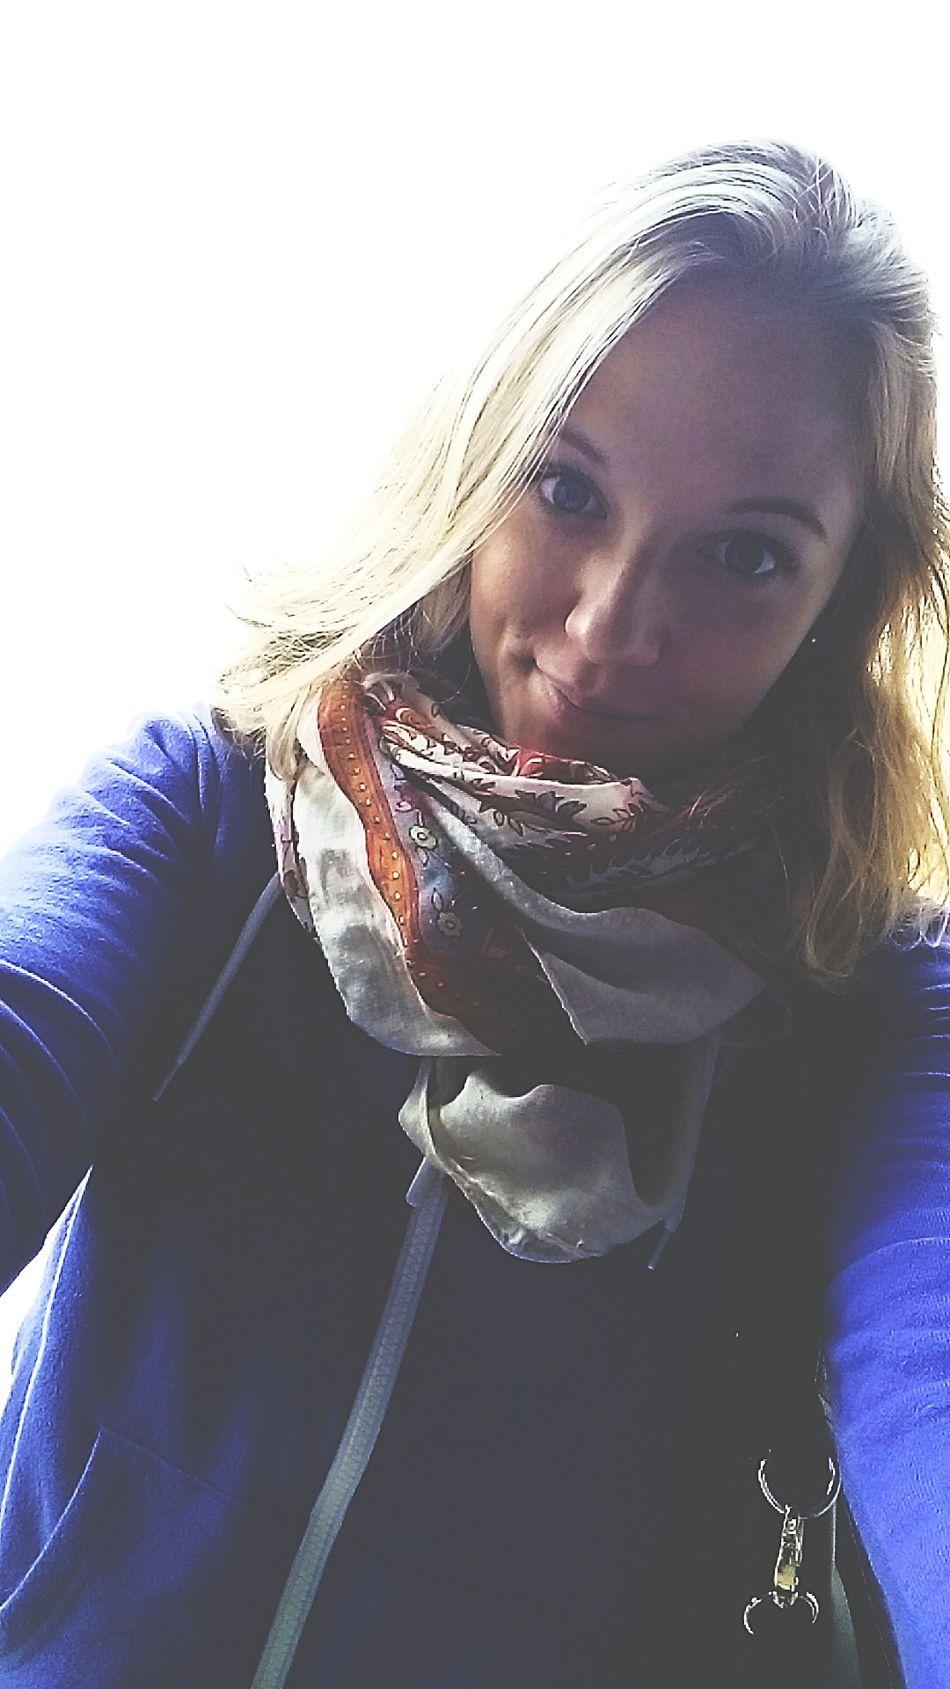 Selfie ✌ Coucoucestmoi Autoportrait Ilovedublin Aupairlife LearnEnglish Better Enjoying Life